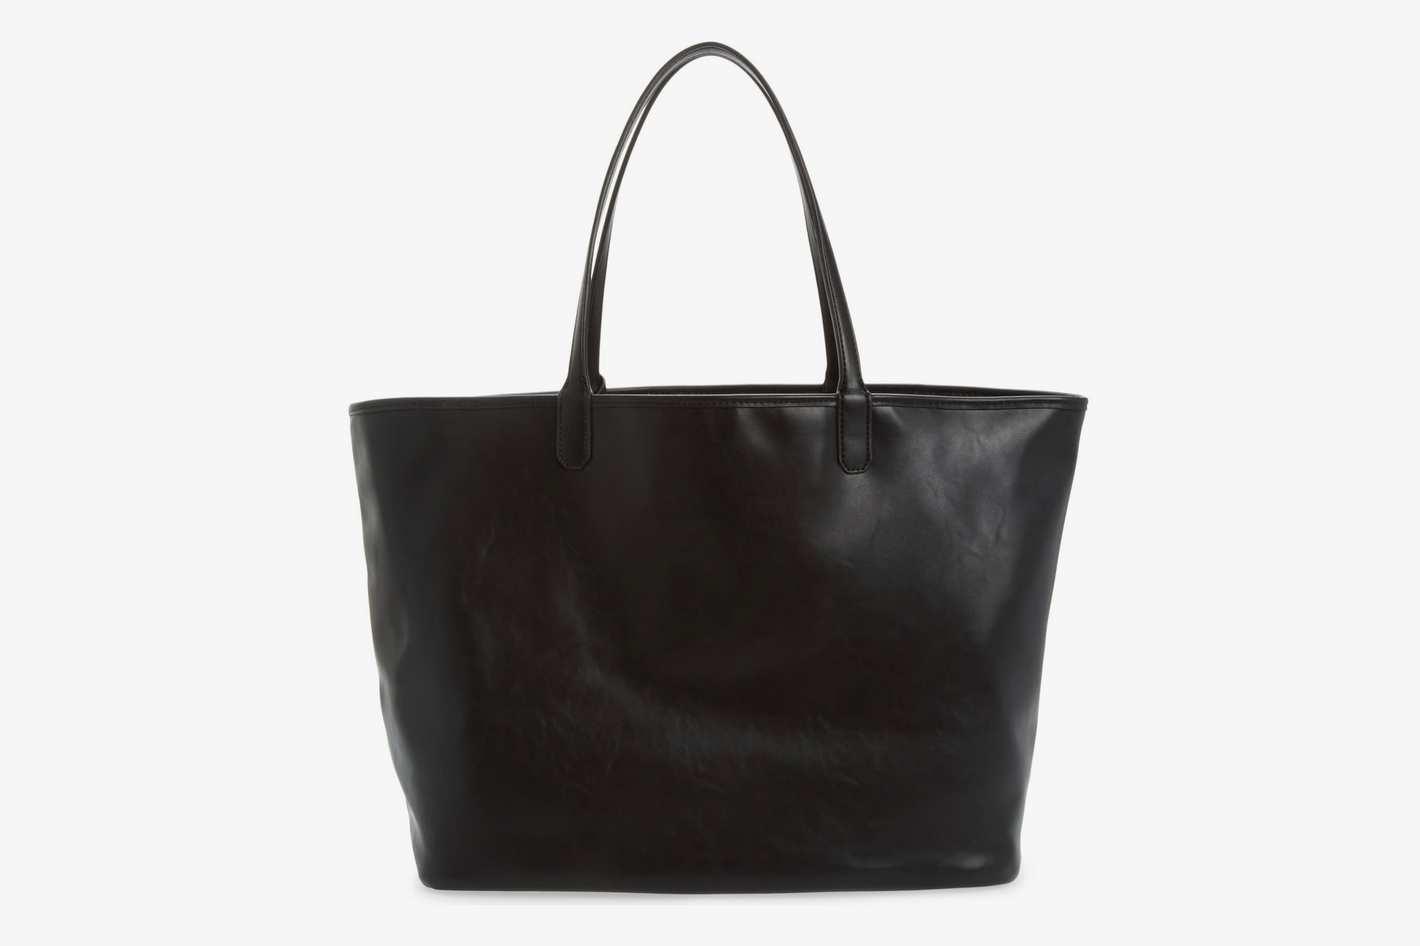 MALI + LILI Reversible Vegan Leather Tote